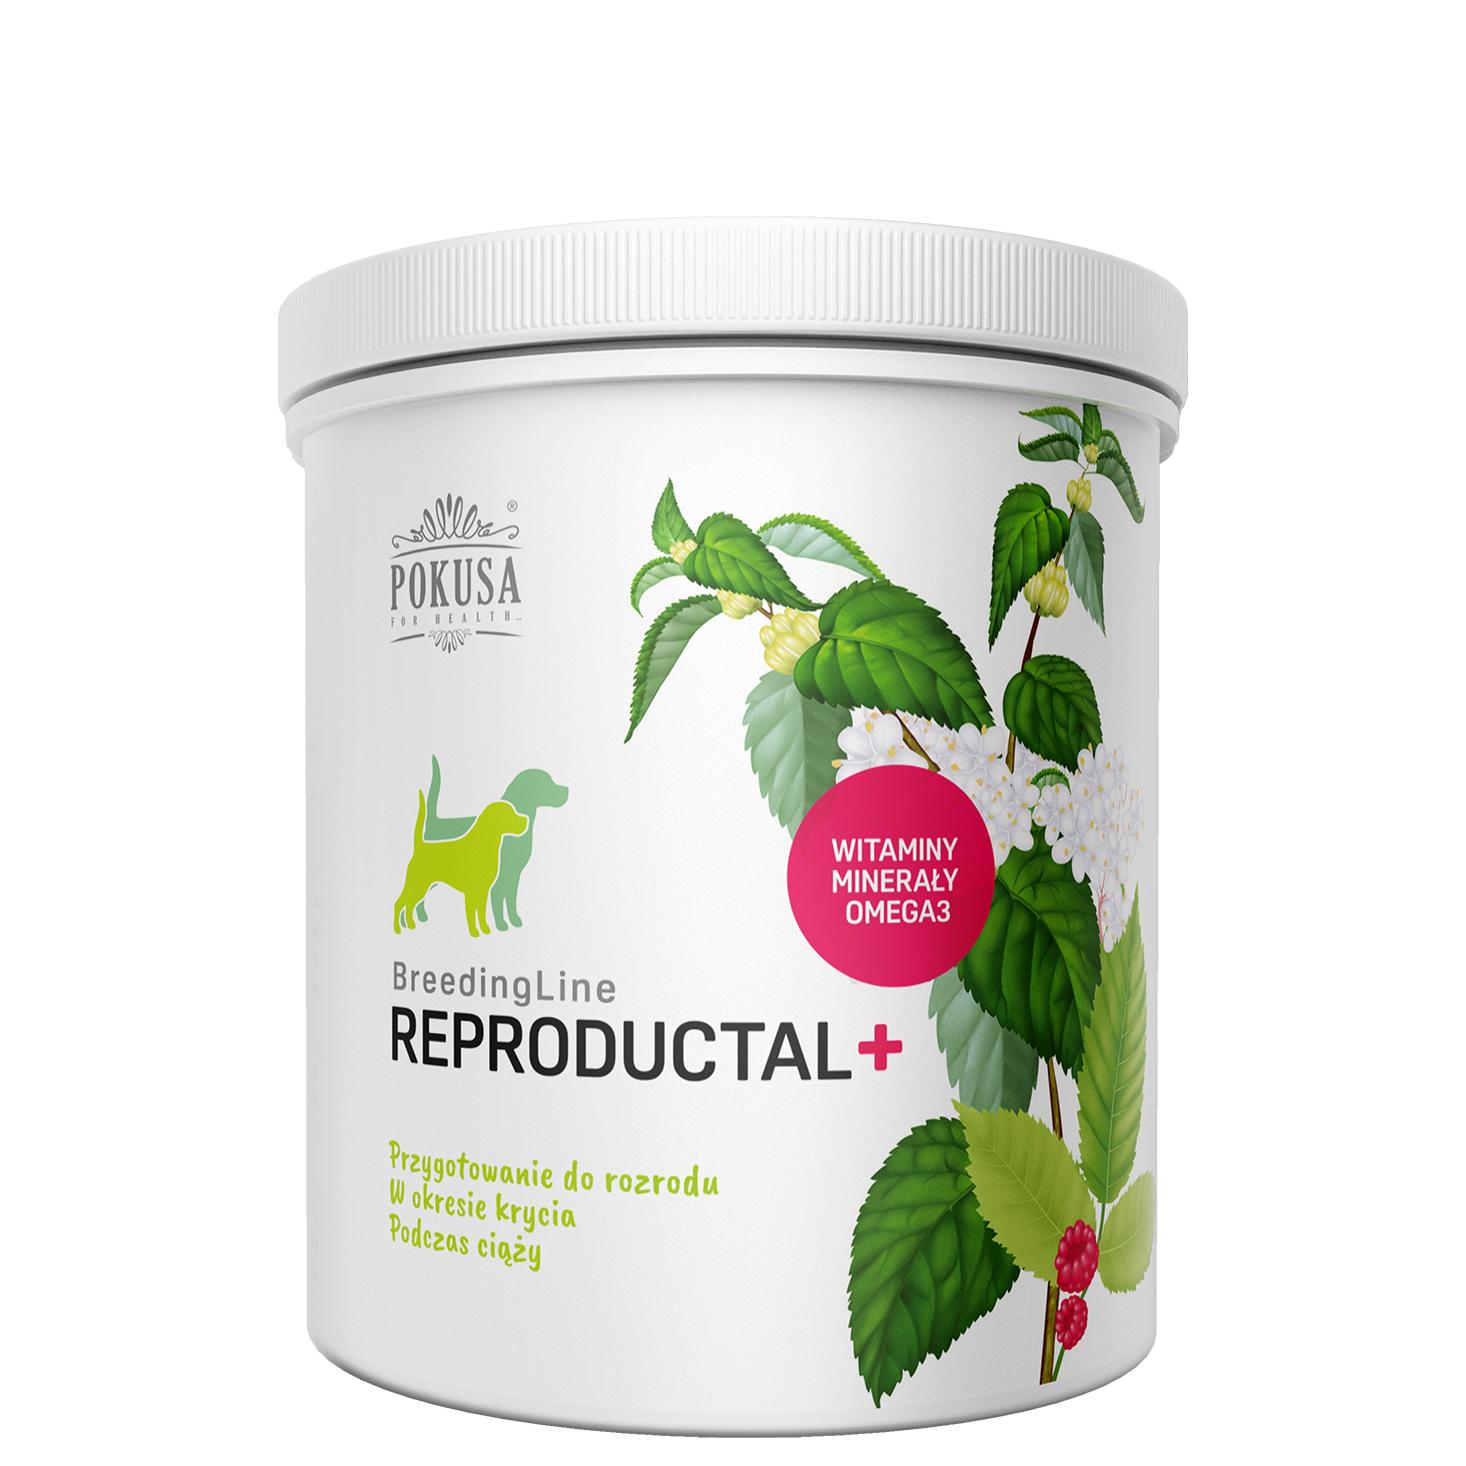 Pokusa BreedingLine Reproductal + 350g